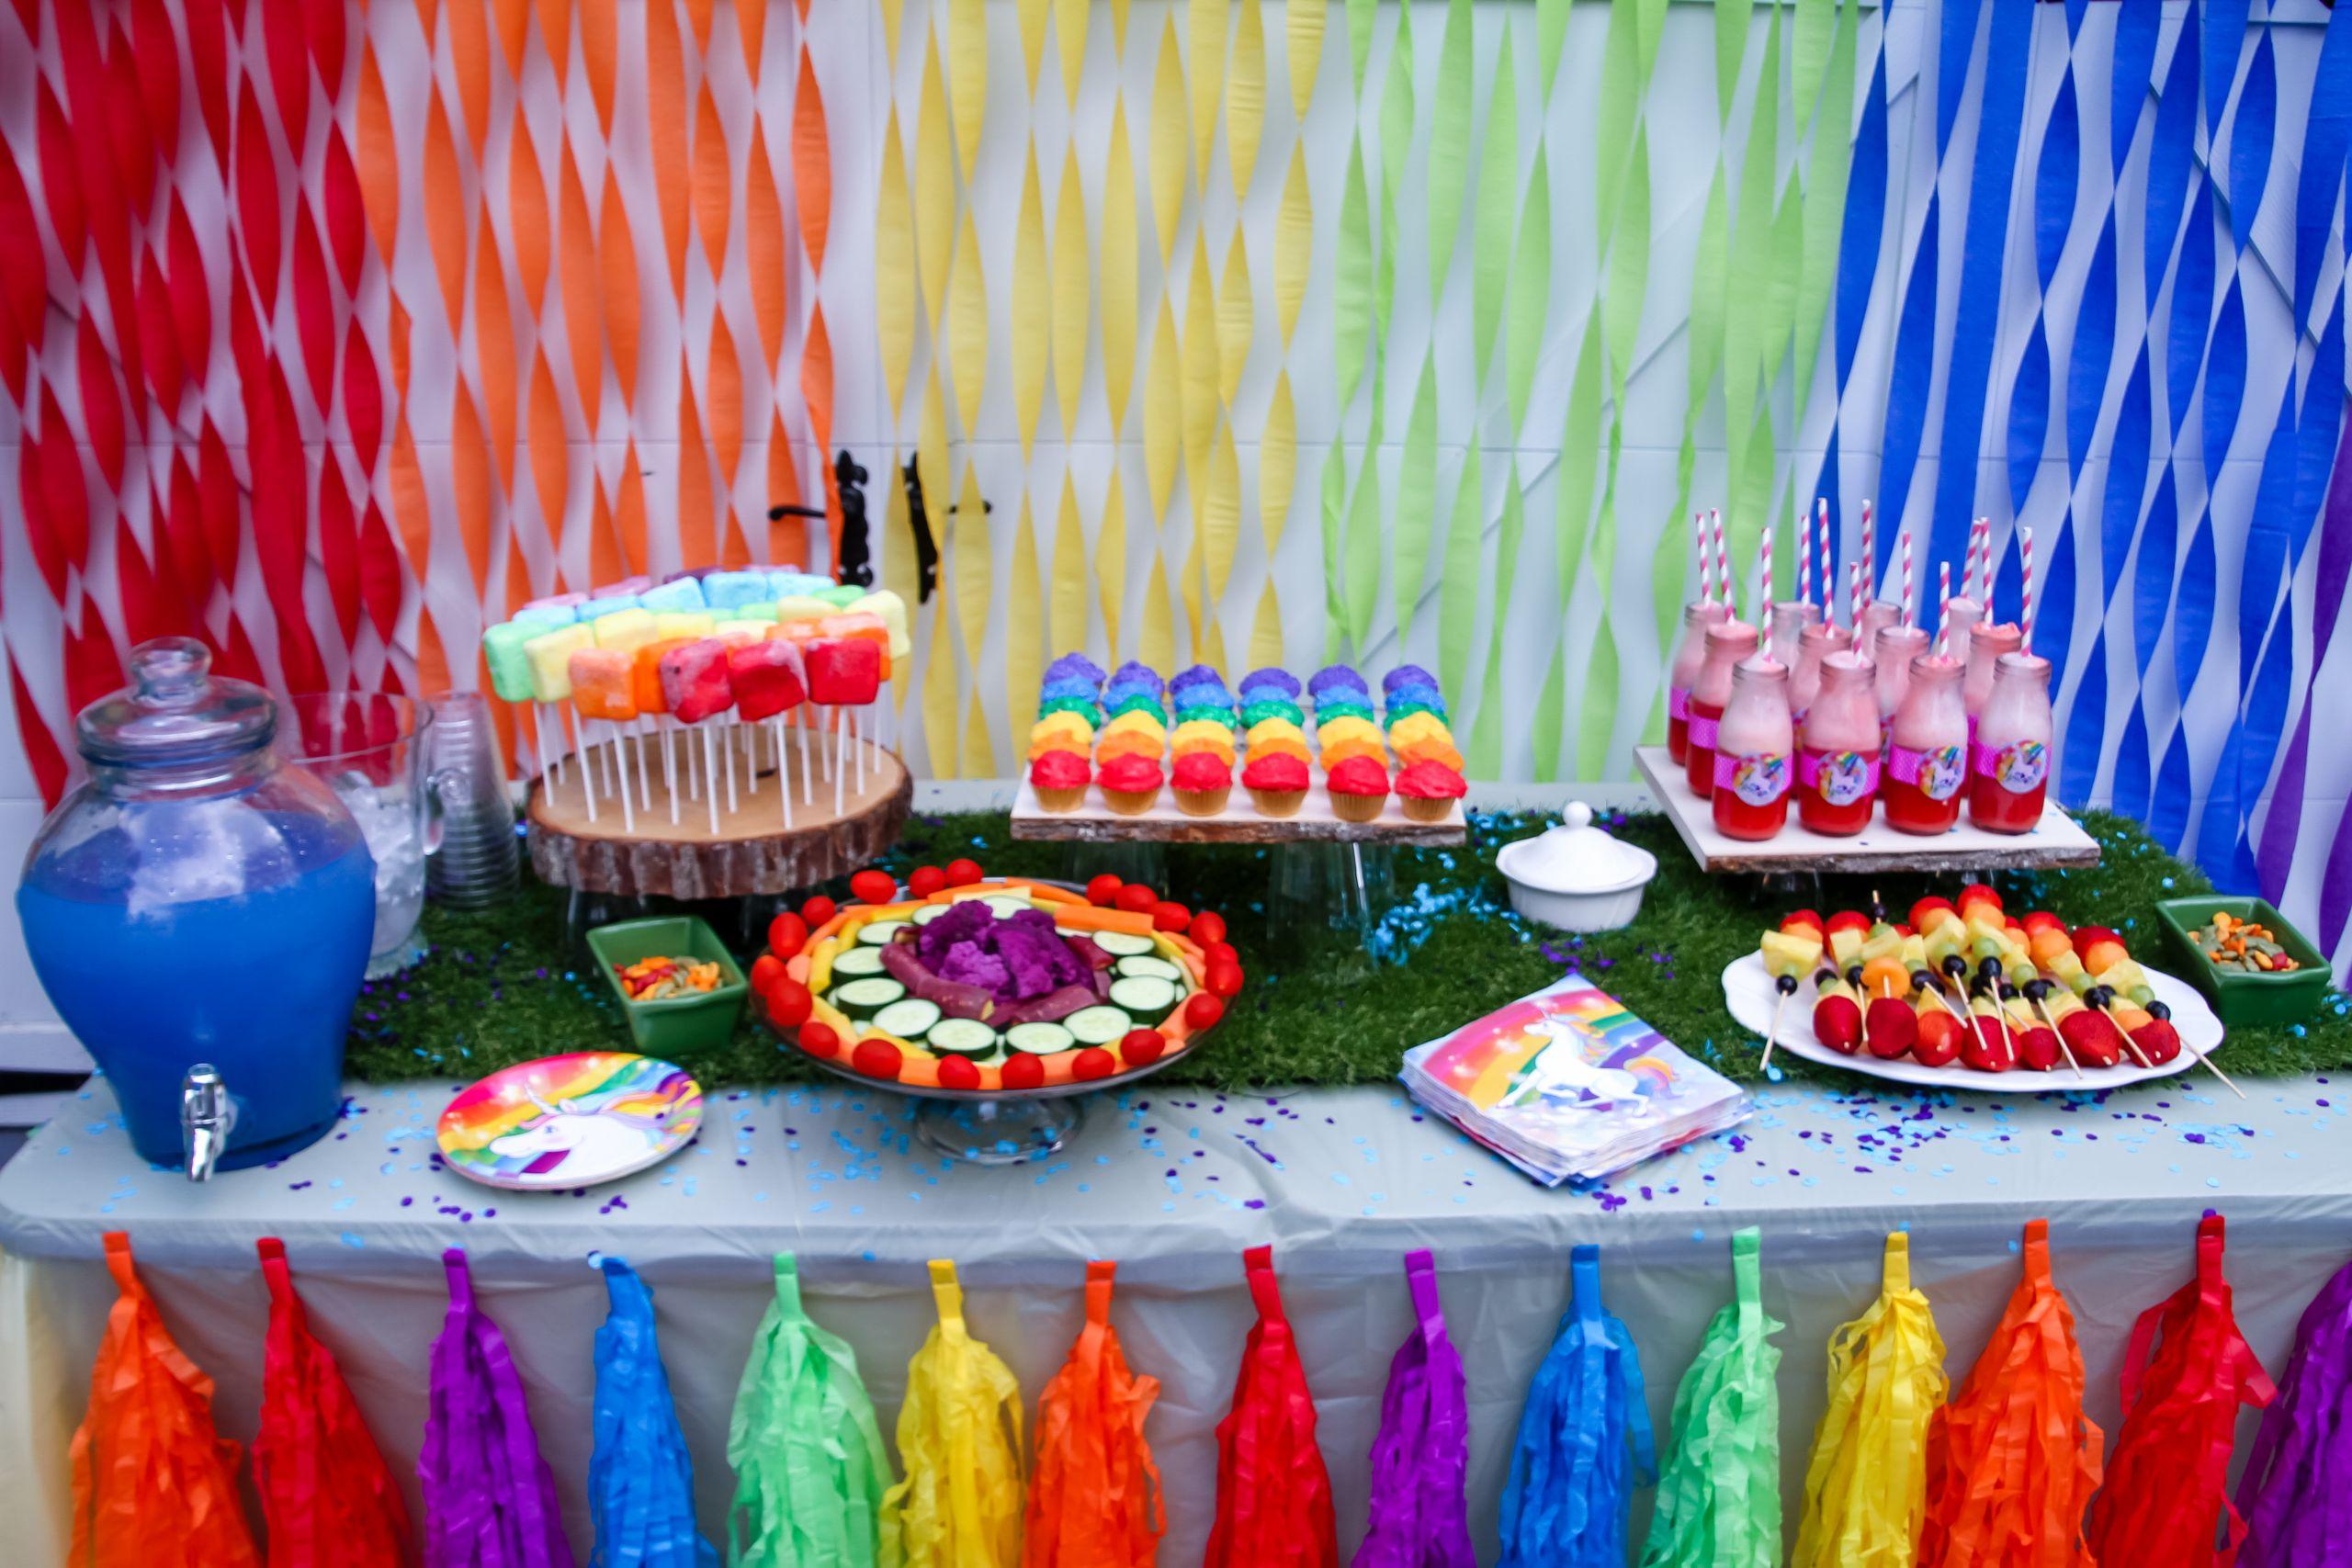 Unicorn Party Theme Food Ideas  Throw the ultimate unicorn rainbow unicorn party for a